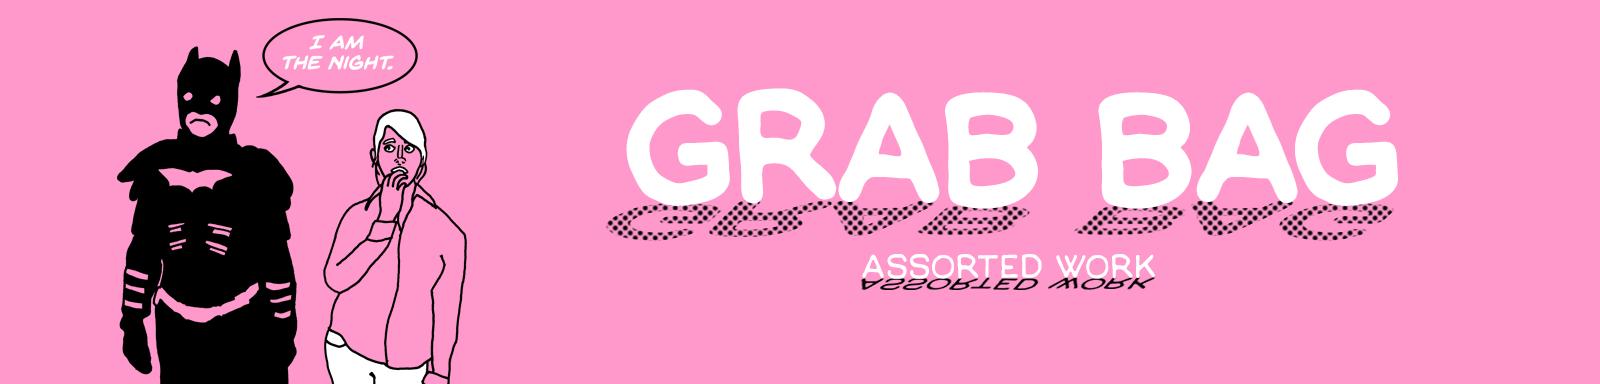 Grabbag_Banner_Update.png